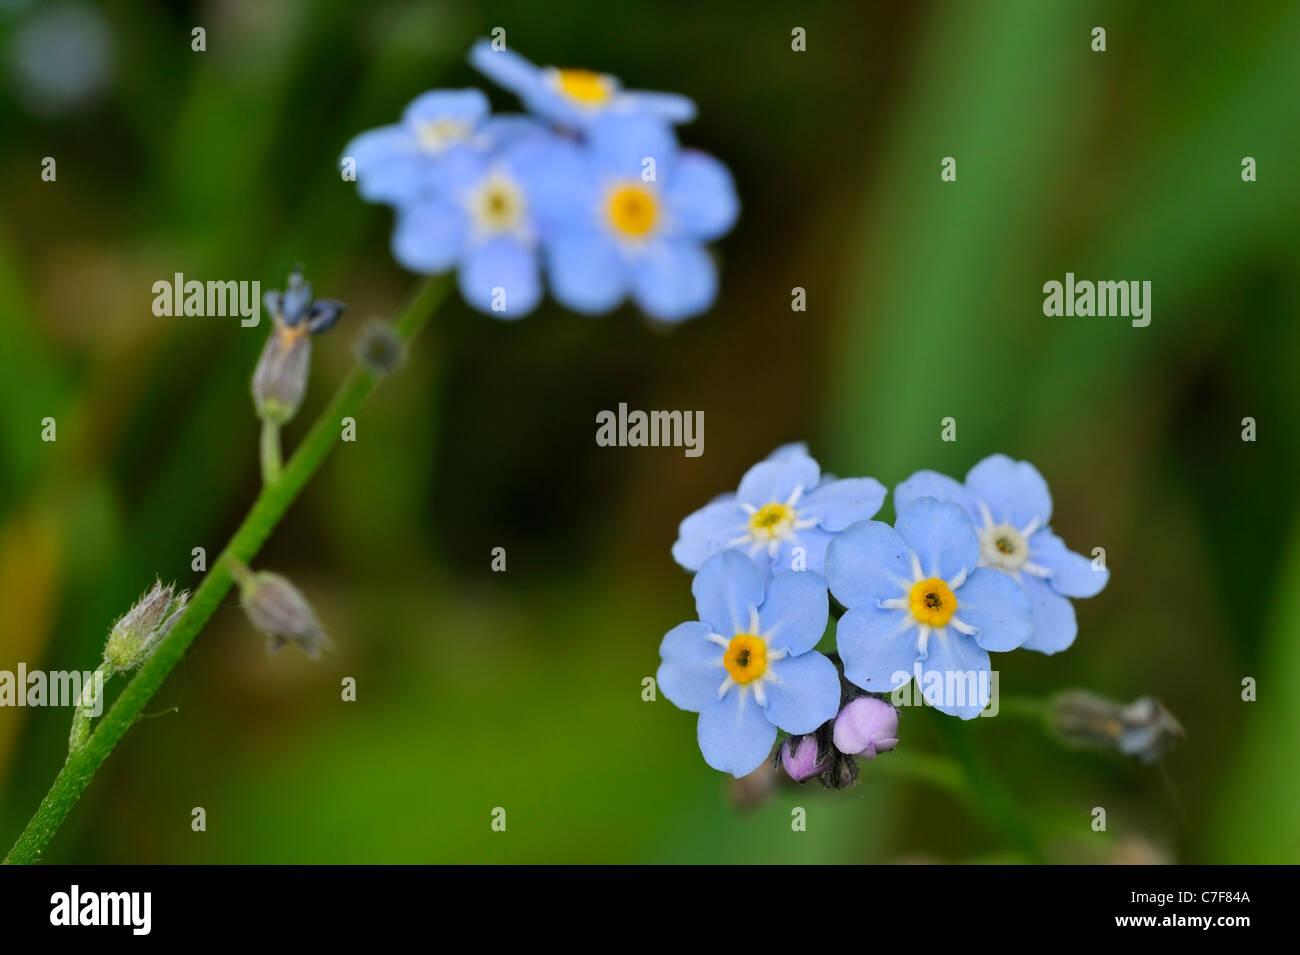 Water Forget-me-not / True Forget-me-not (Myosotis scorpioides / Myosotis palustris) in flower, Belgium Stock Photo